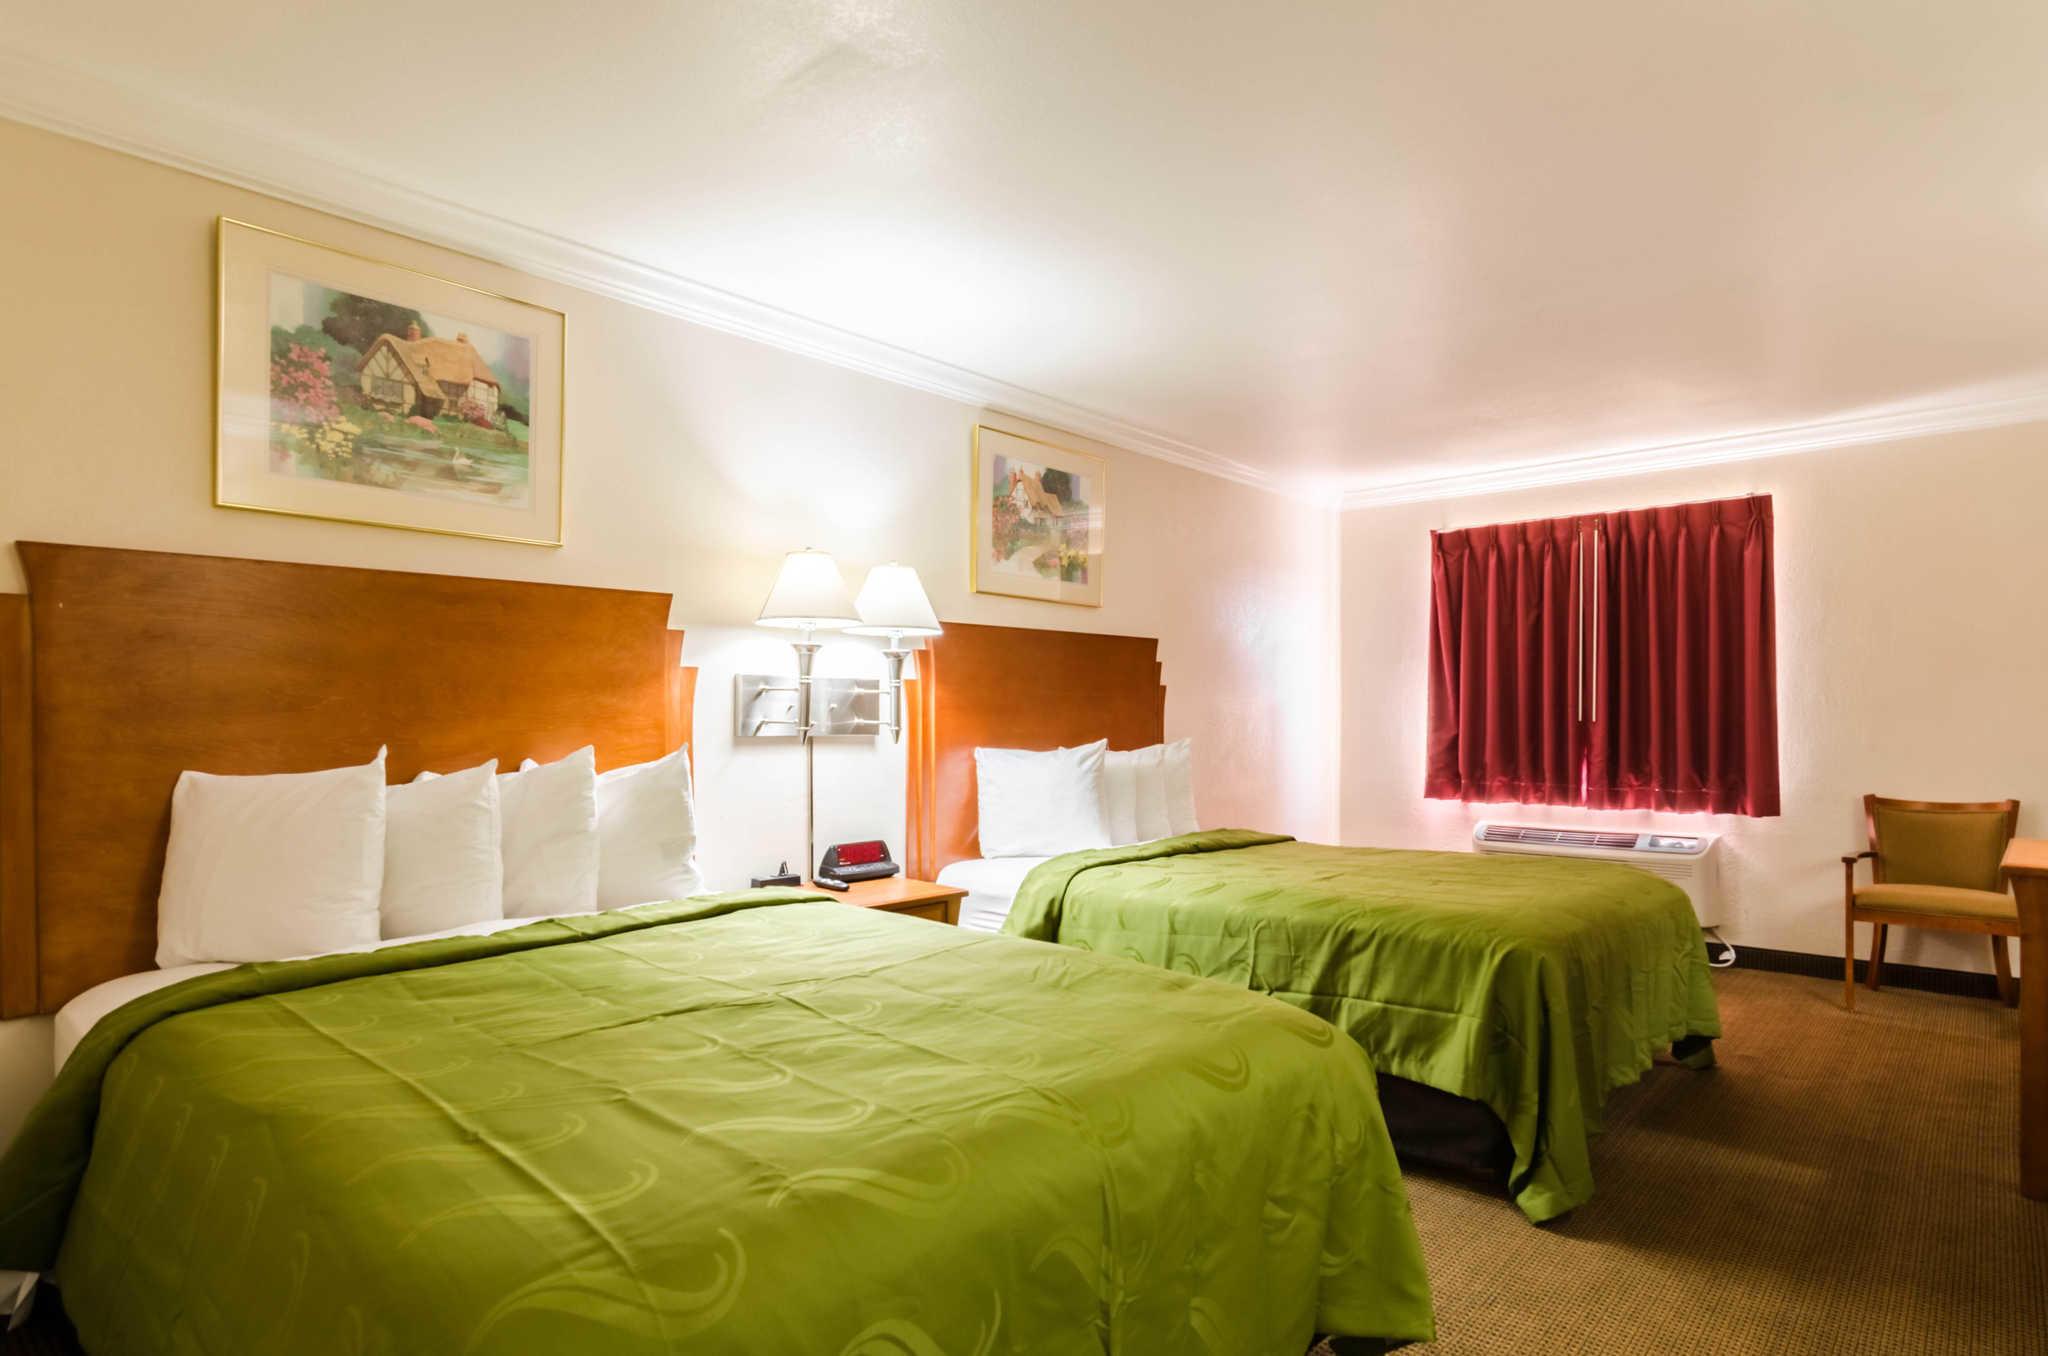 Quality Inn & Suites image 42